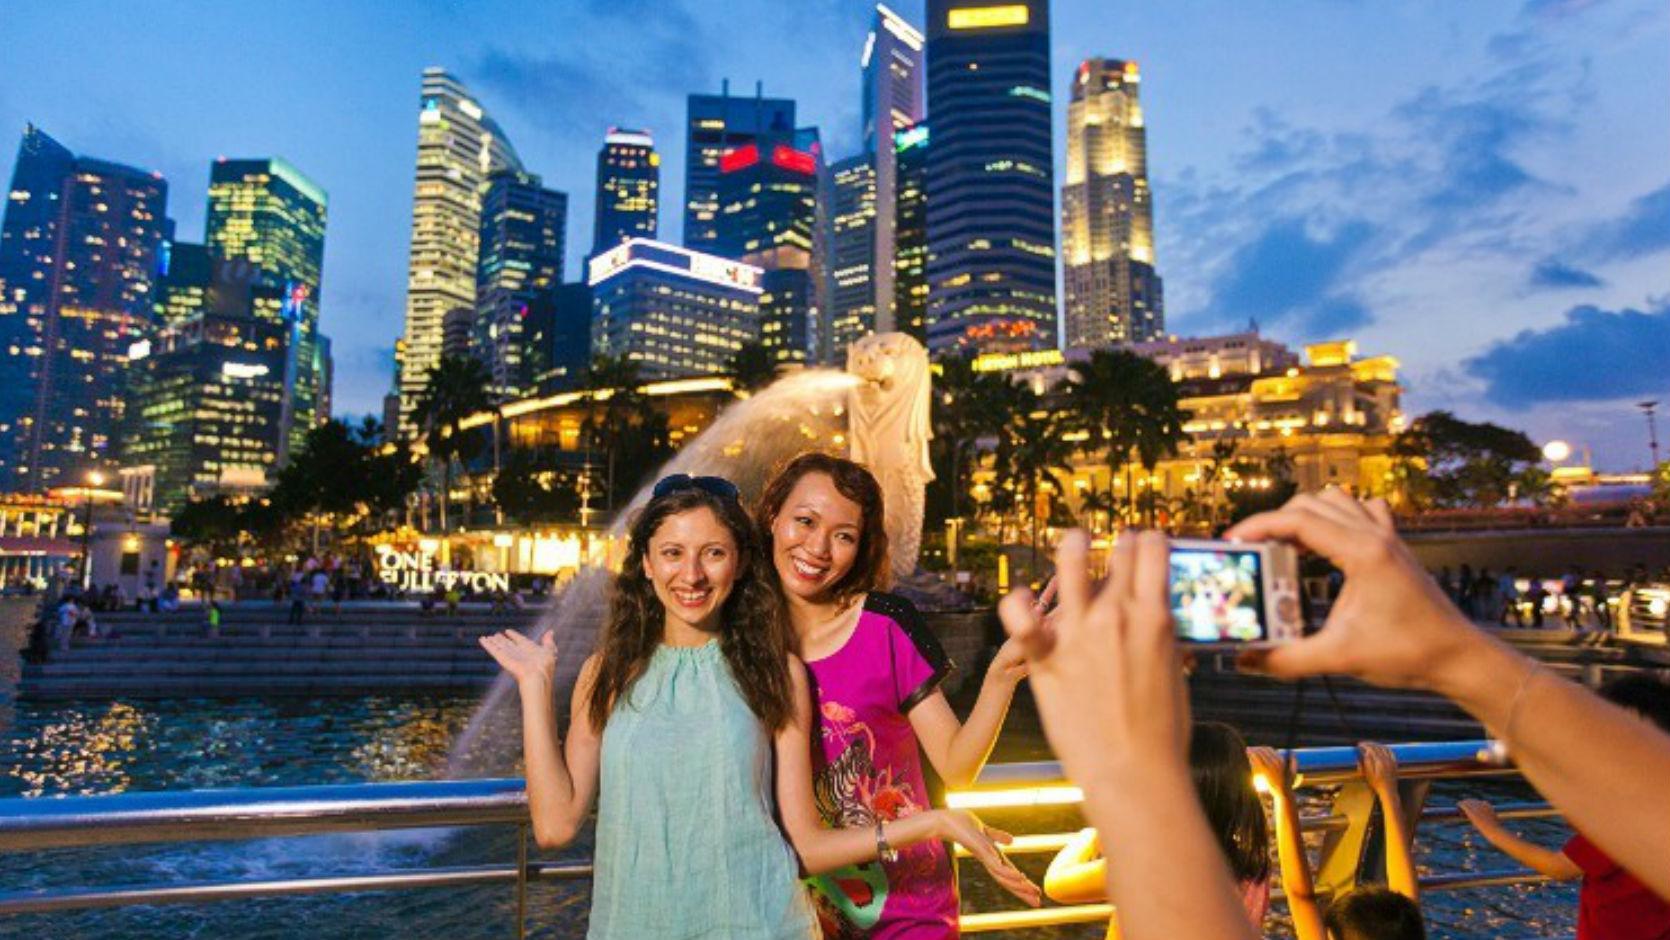 Cuma modal foto, kamu bisa gratis keliling Singapura! Ikuti #SGAduSeru